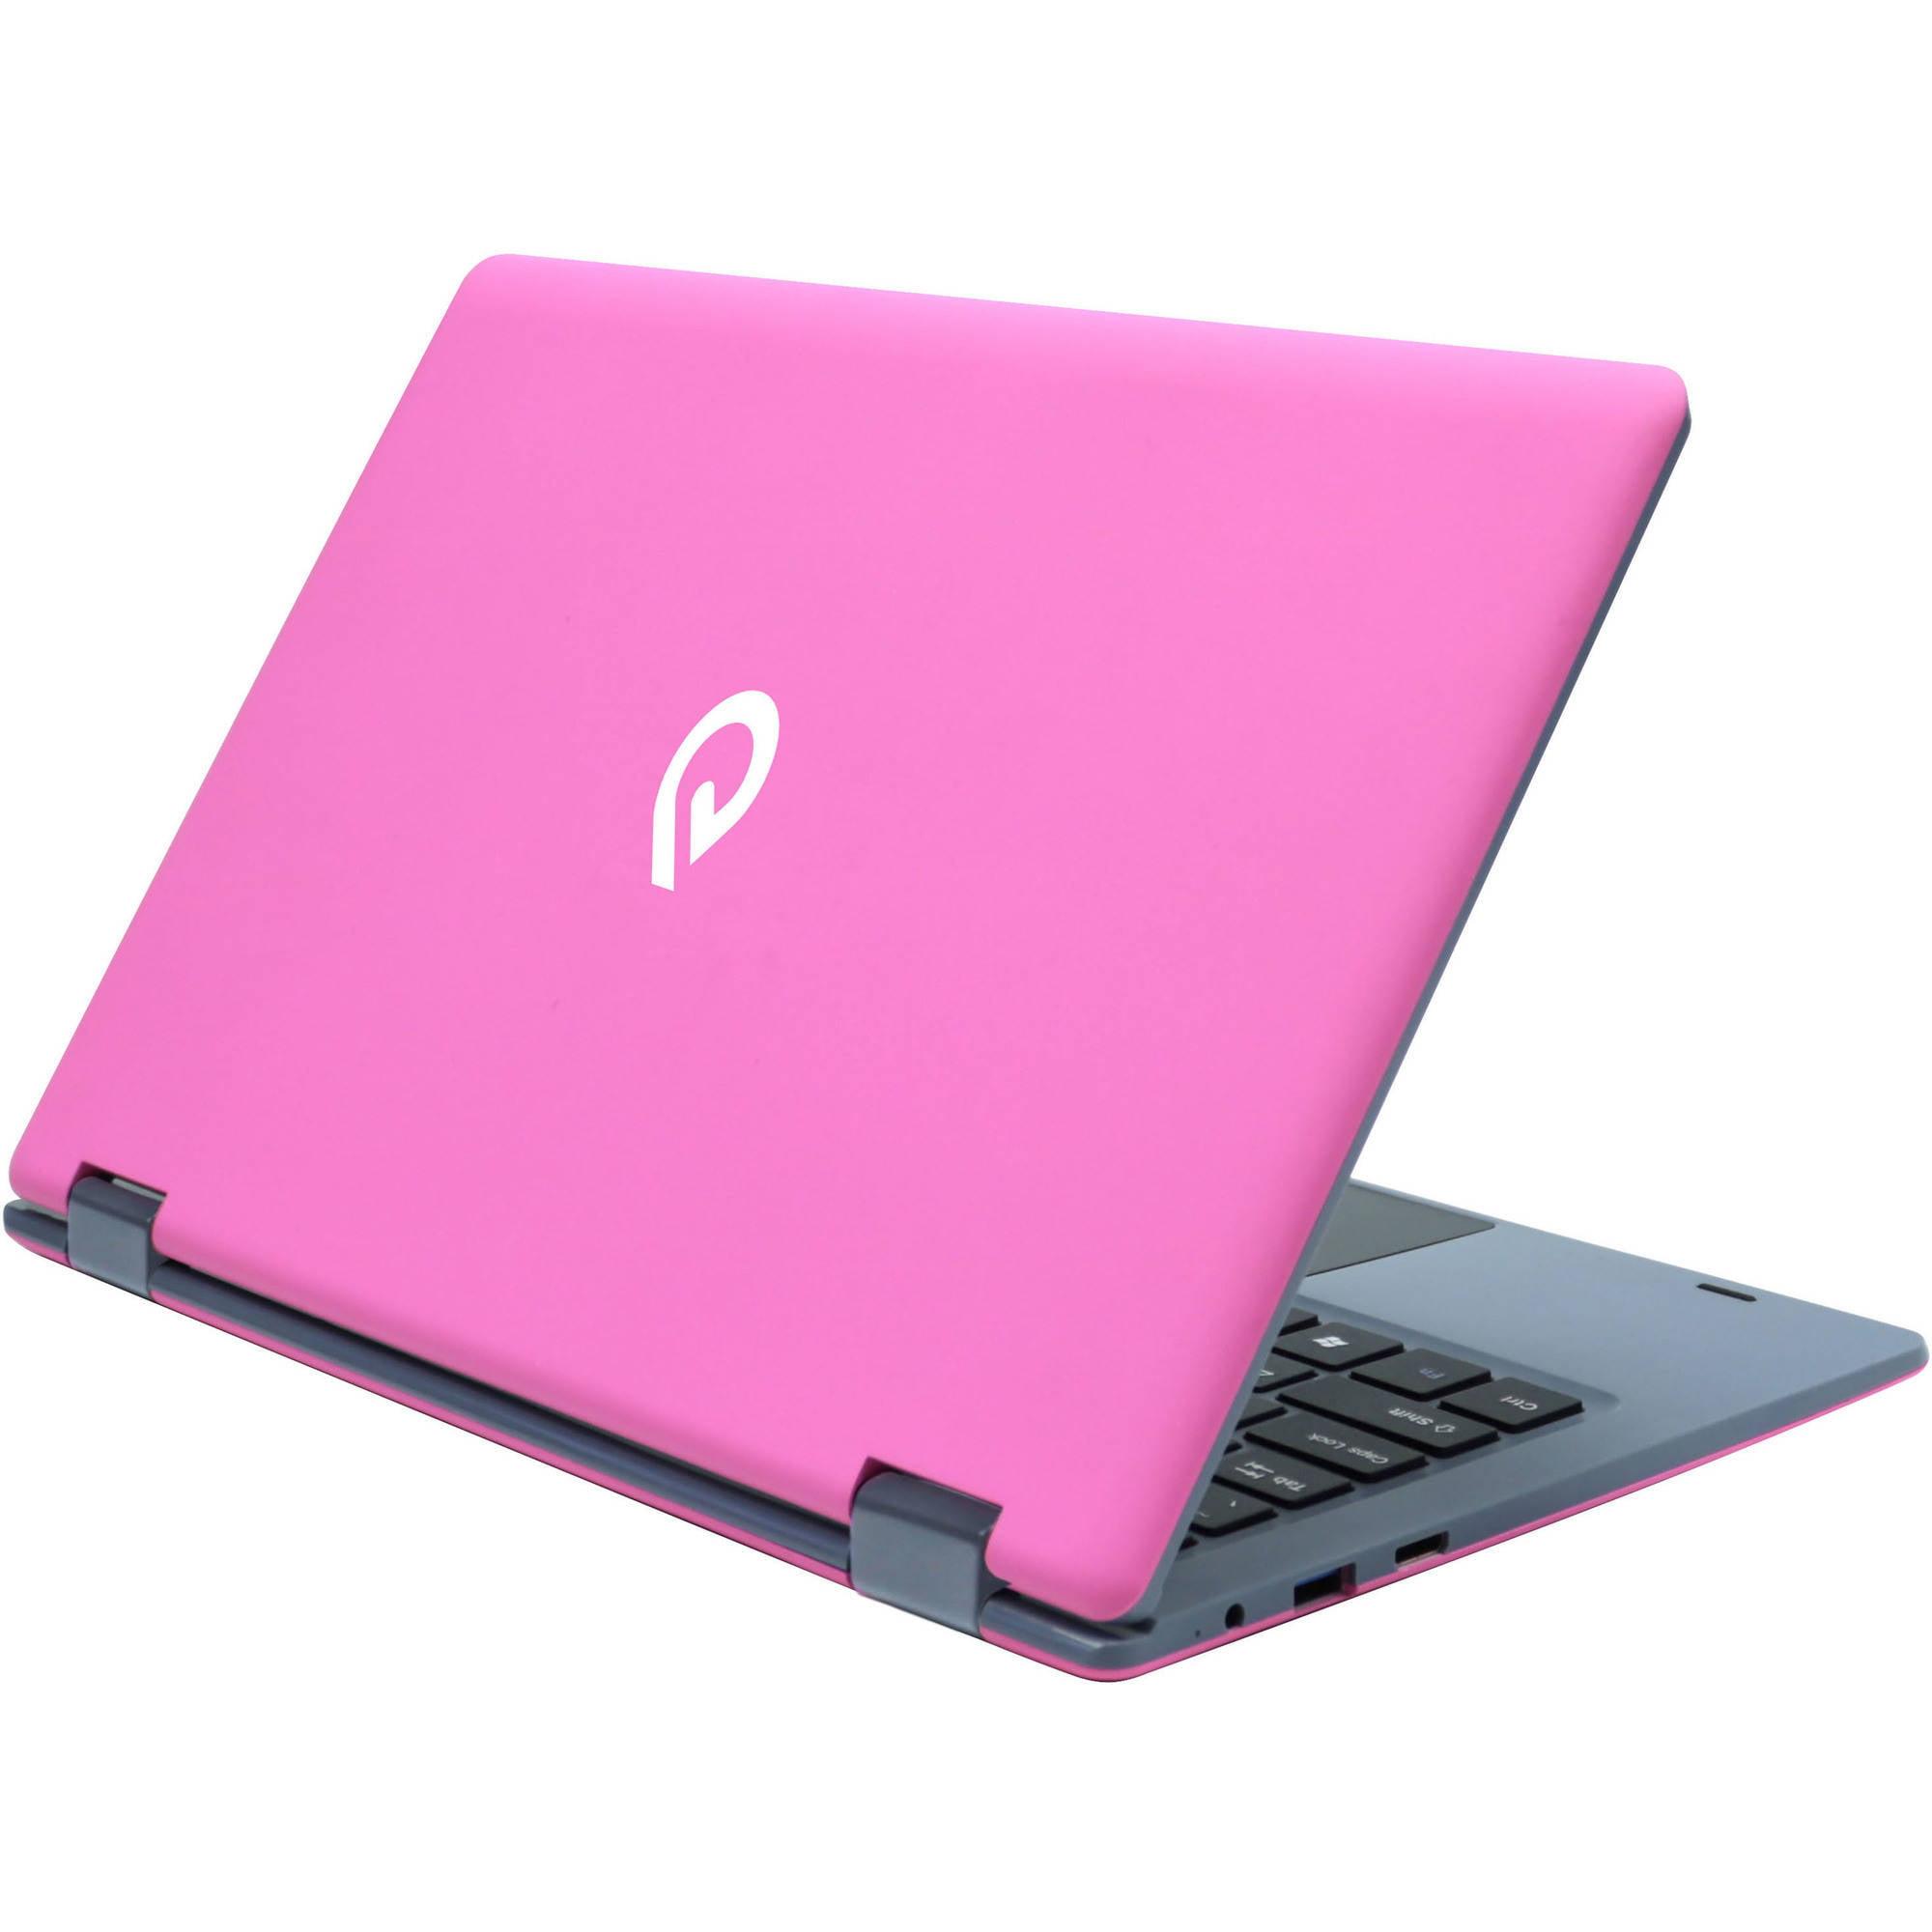 "Teqnio ELL1103T 11.6"" Laptop, Touchscreen, 2-in-1, Windows 10 Home, Intel Cherrytrail Z8350 Processor,... by EPIK"